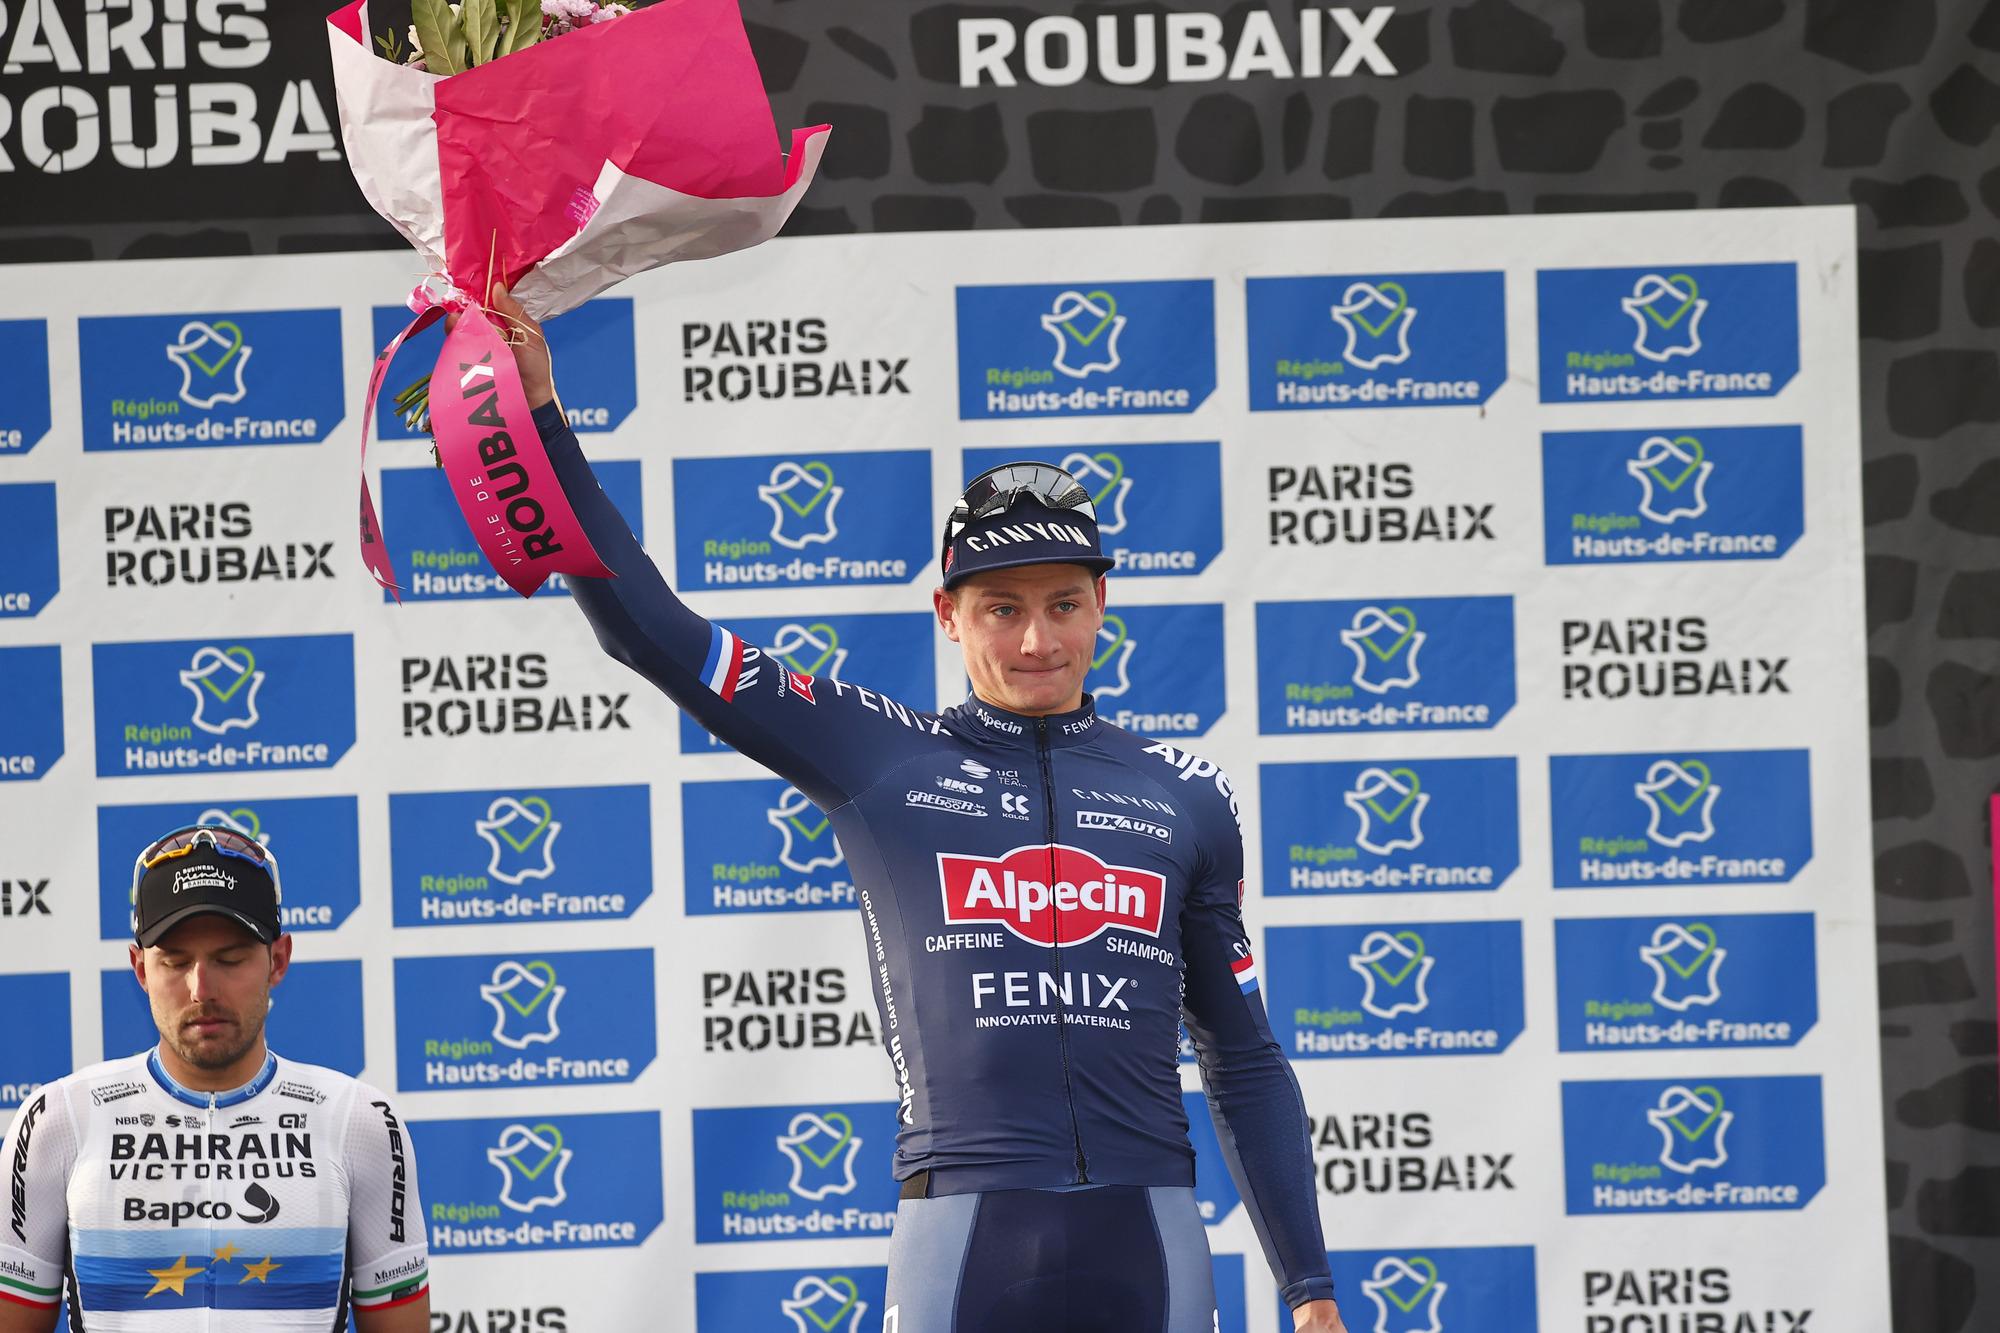 Paris Roubaix 2021 118th Edition Denain Roubaix 2577 km 03102021 Sonny Colbrelli ITA Bahrain Victorious Mathieu Van Der Poel NED AlpecinFenix photo Luca BettiniBettiniPhoto2021